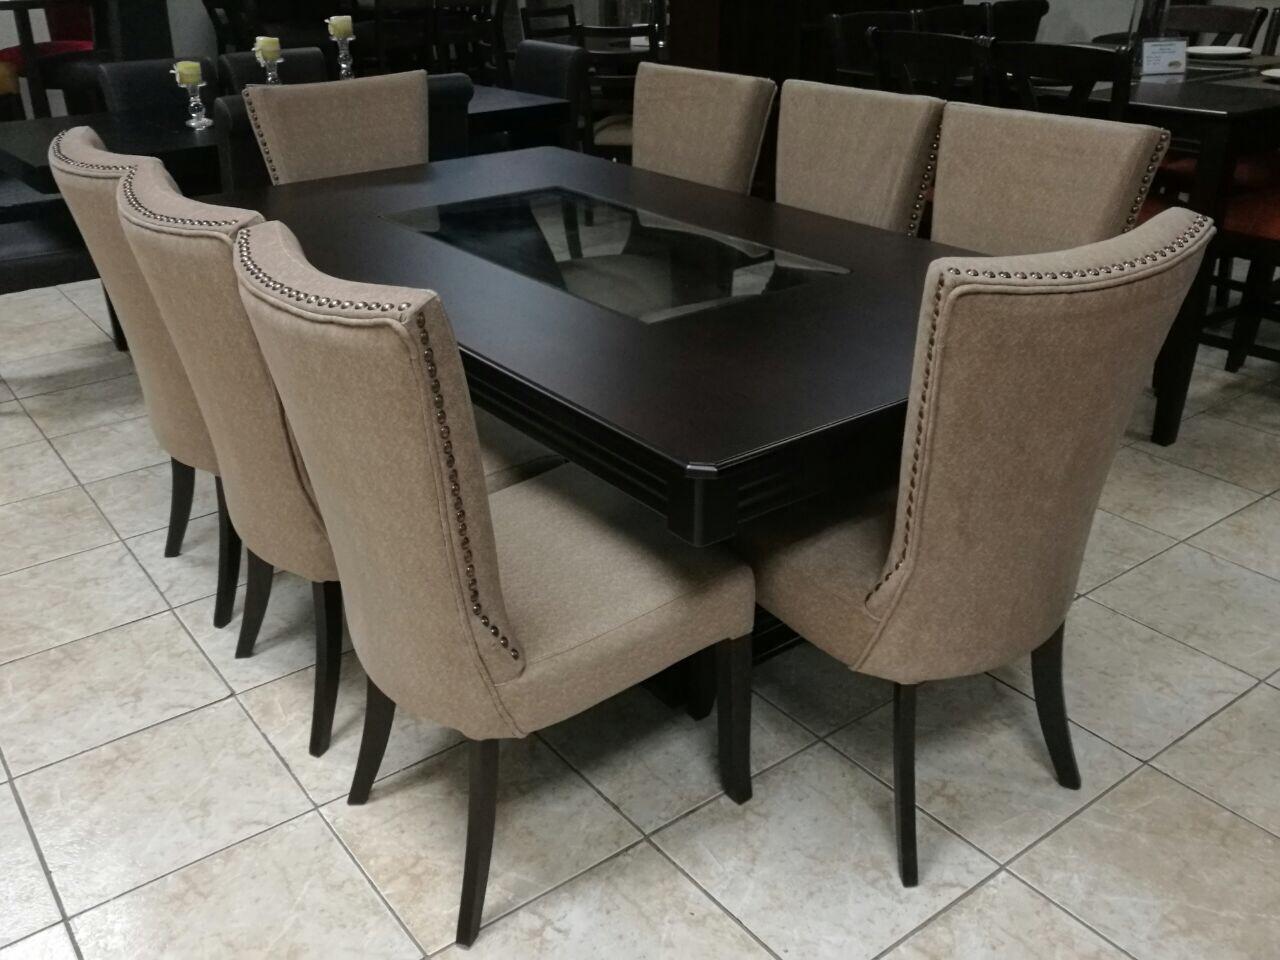 Guatemala muebles primiun productos comedores muebles primiun fabricantes de salas muebles for Modelos de comedores de madera